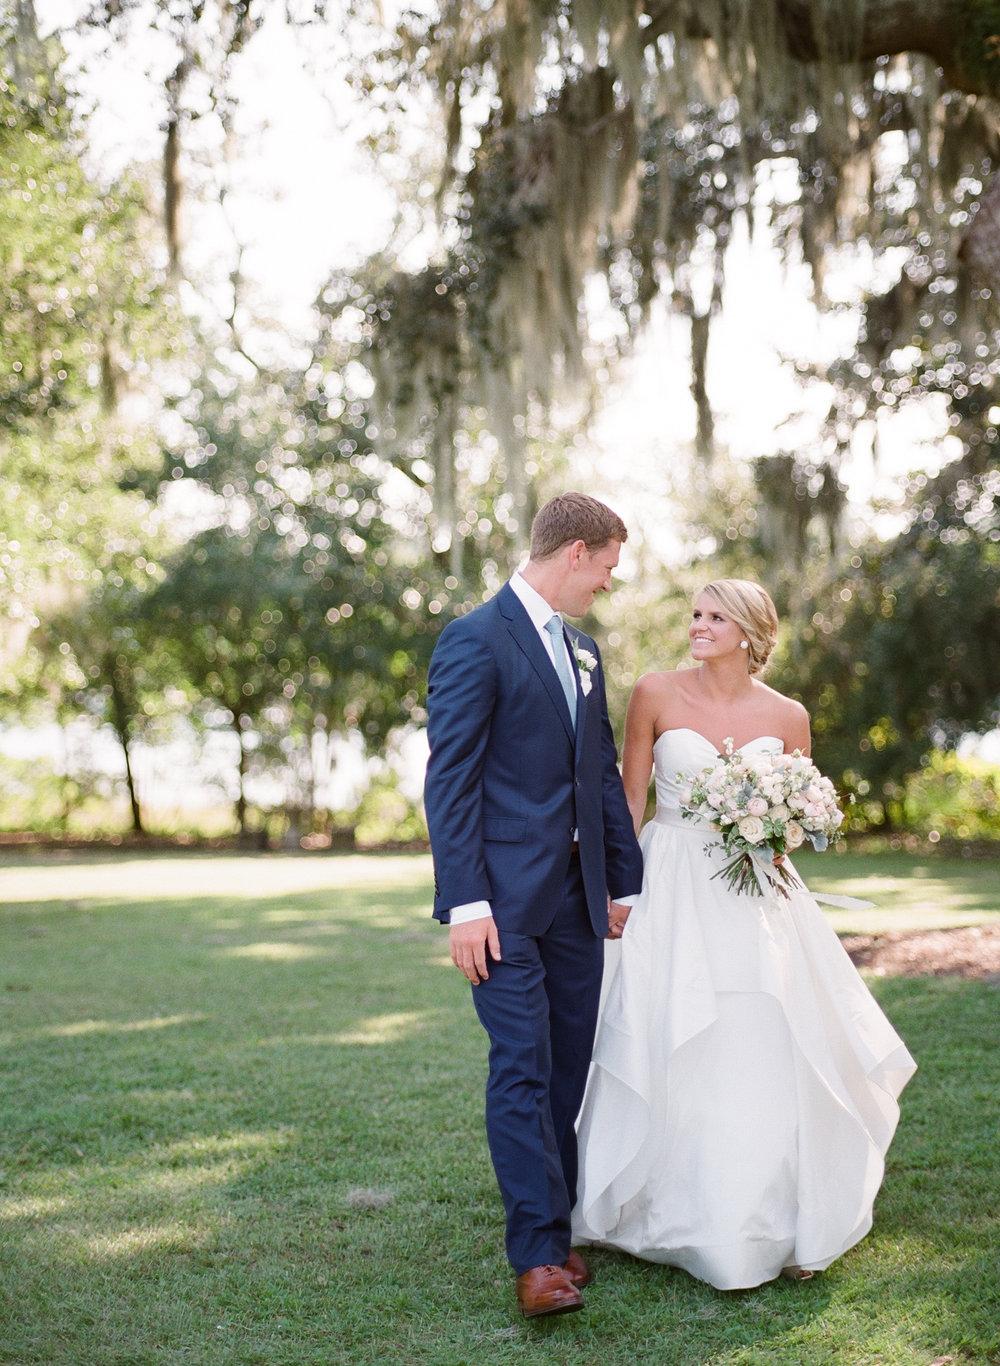 Airlie-Gardens-Wedding-30.jpg